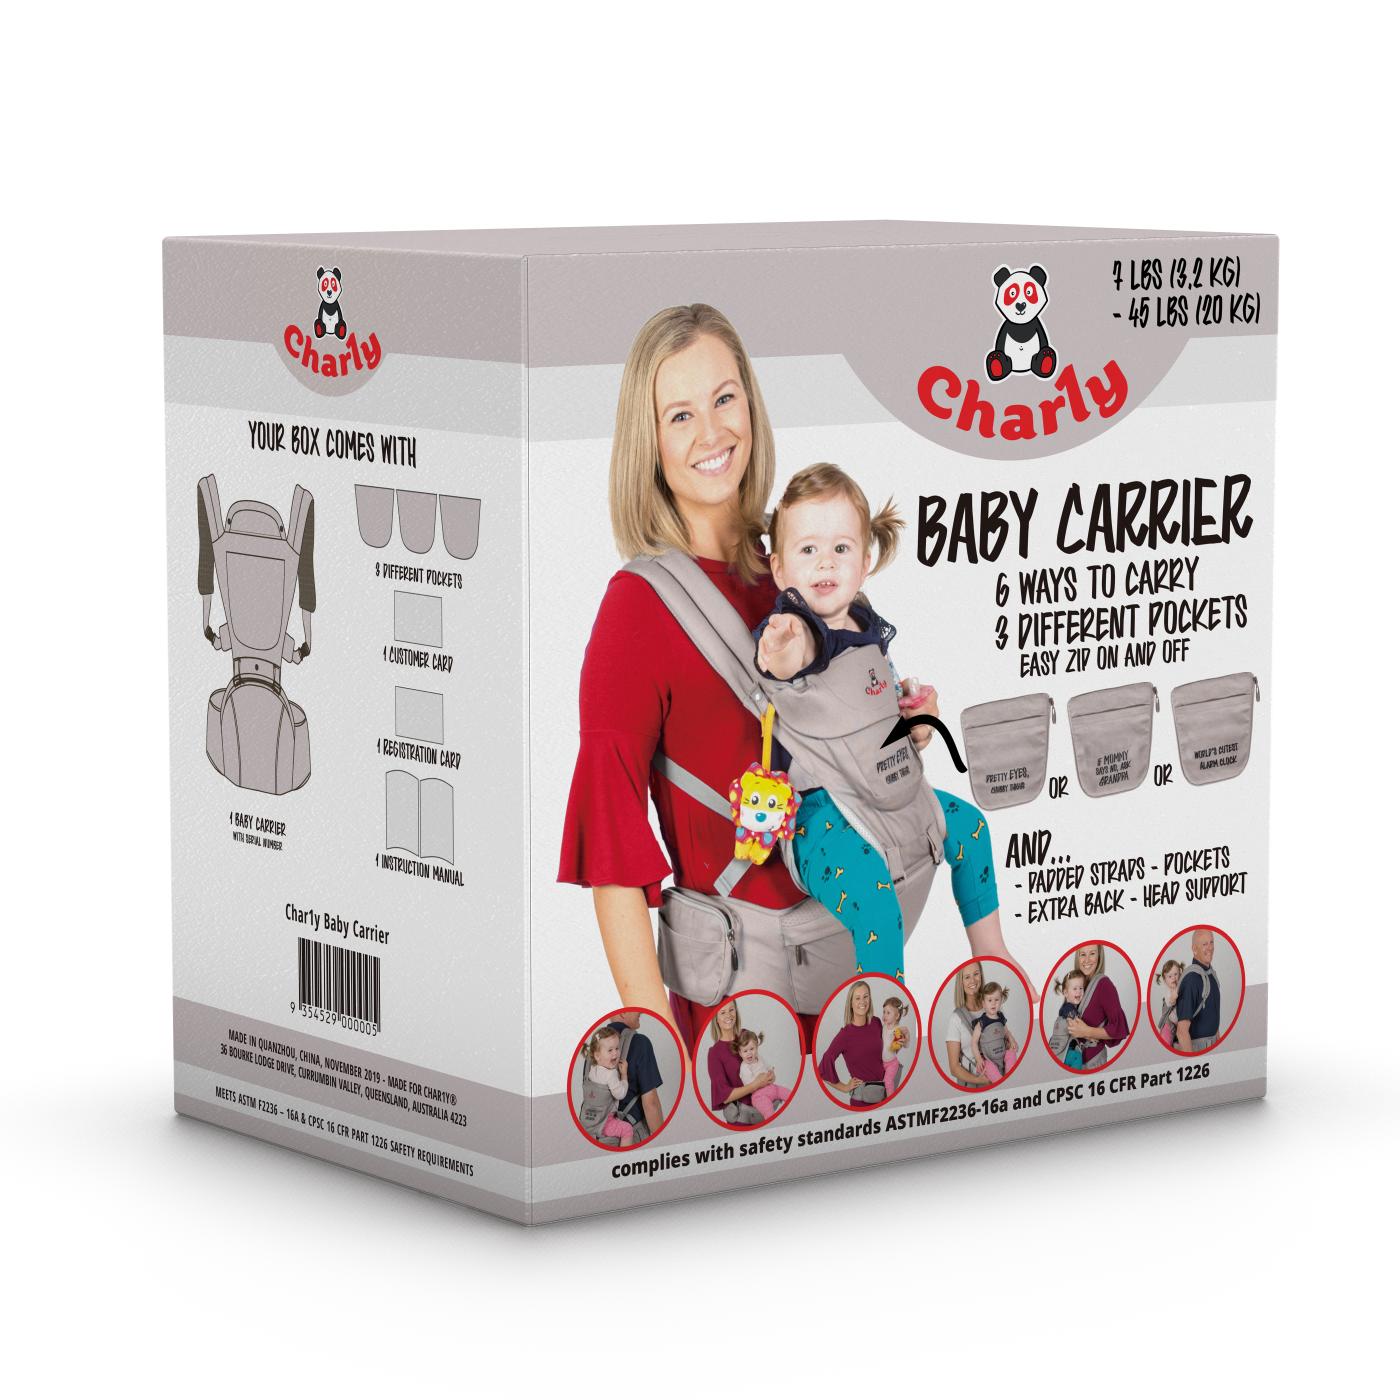 Char1y - Packaging Design